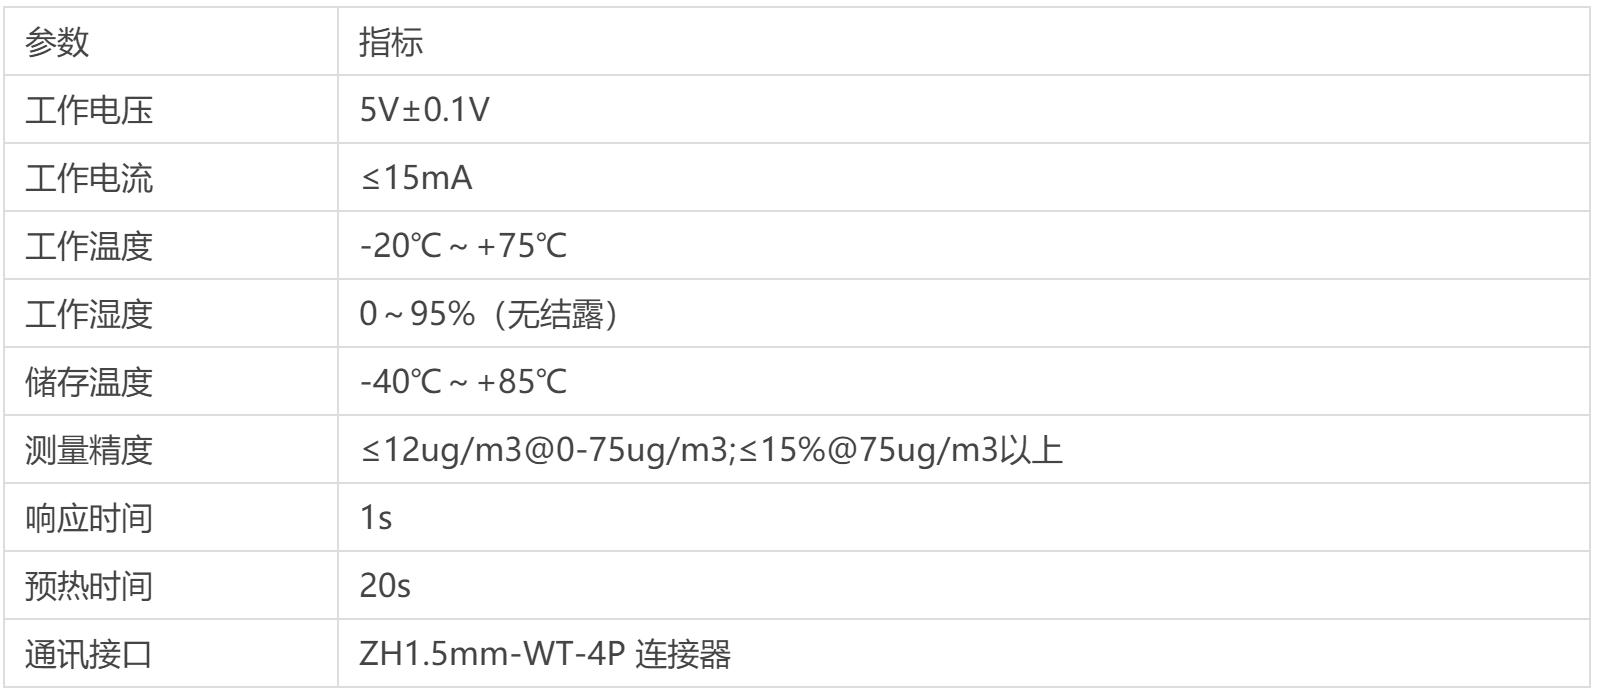 TOMOHO日本友穗红外粉尘传感器DSHD01-C-A